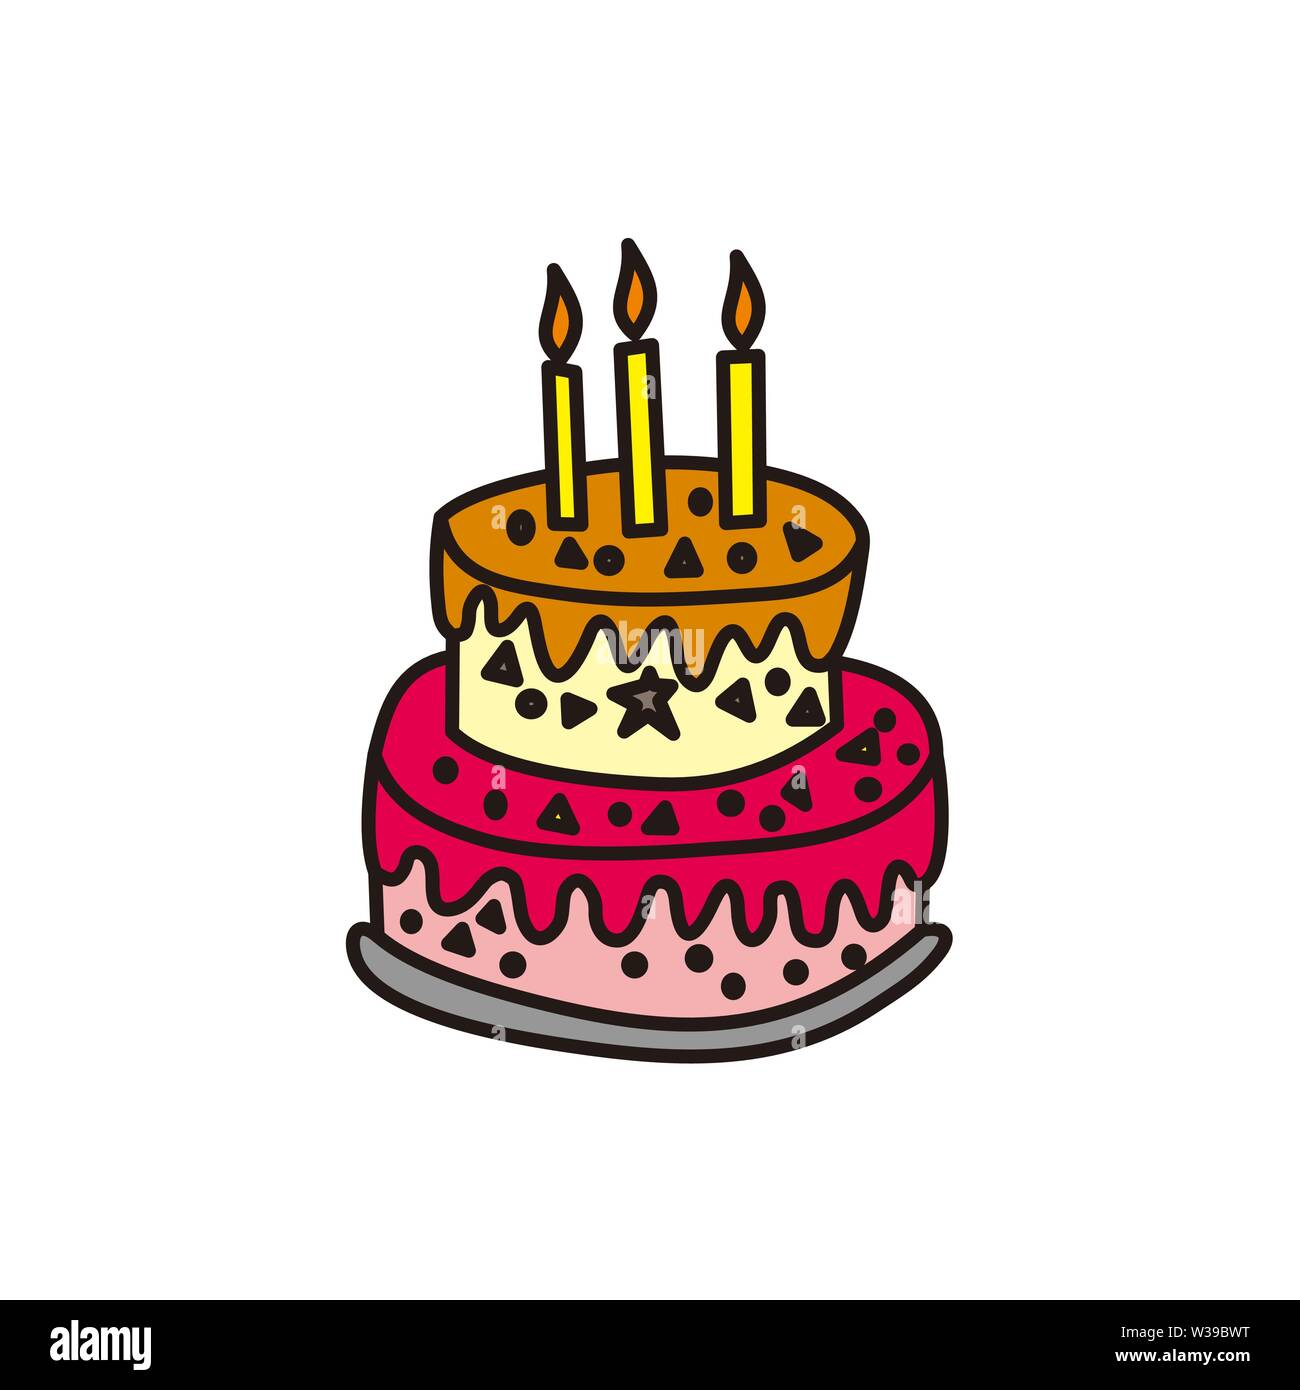 Strange Cake Birthday Design Graphic Template Vector Stock Vector Art Funny Birthday Cards Online Inifodamsfinfo